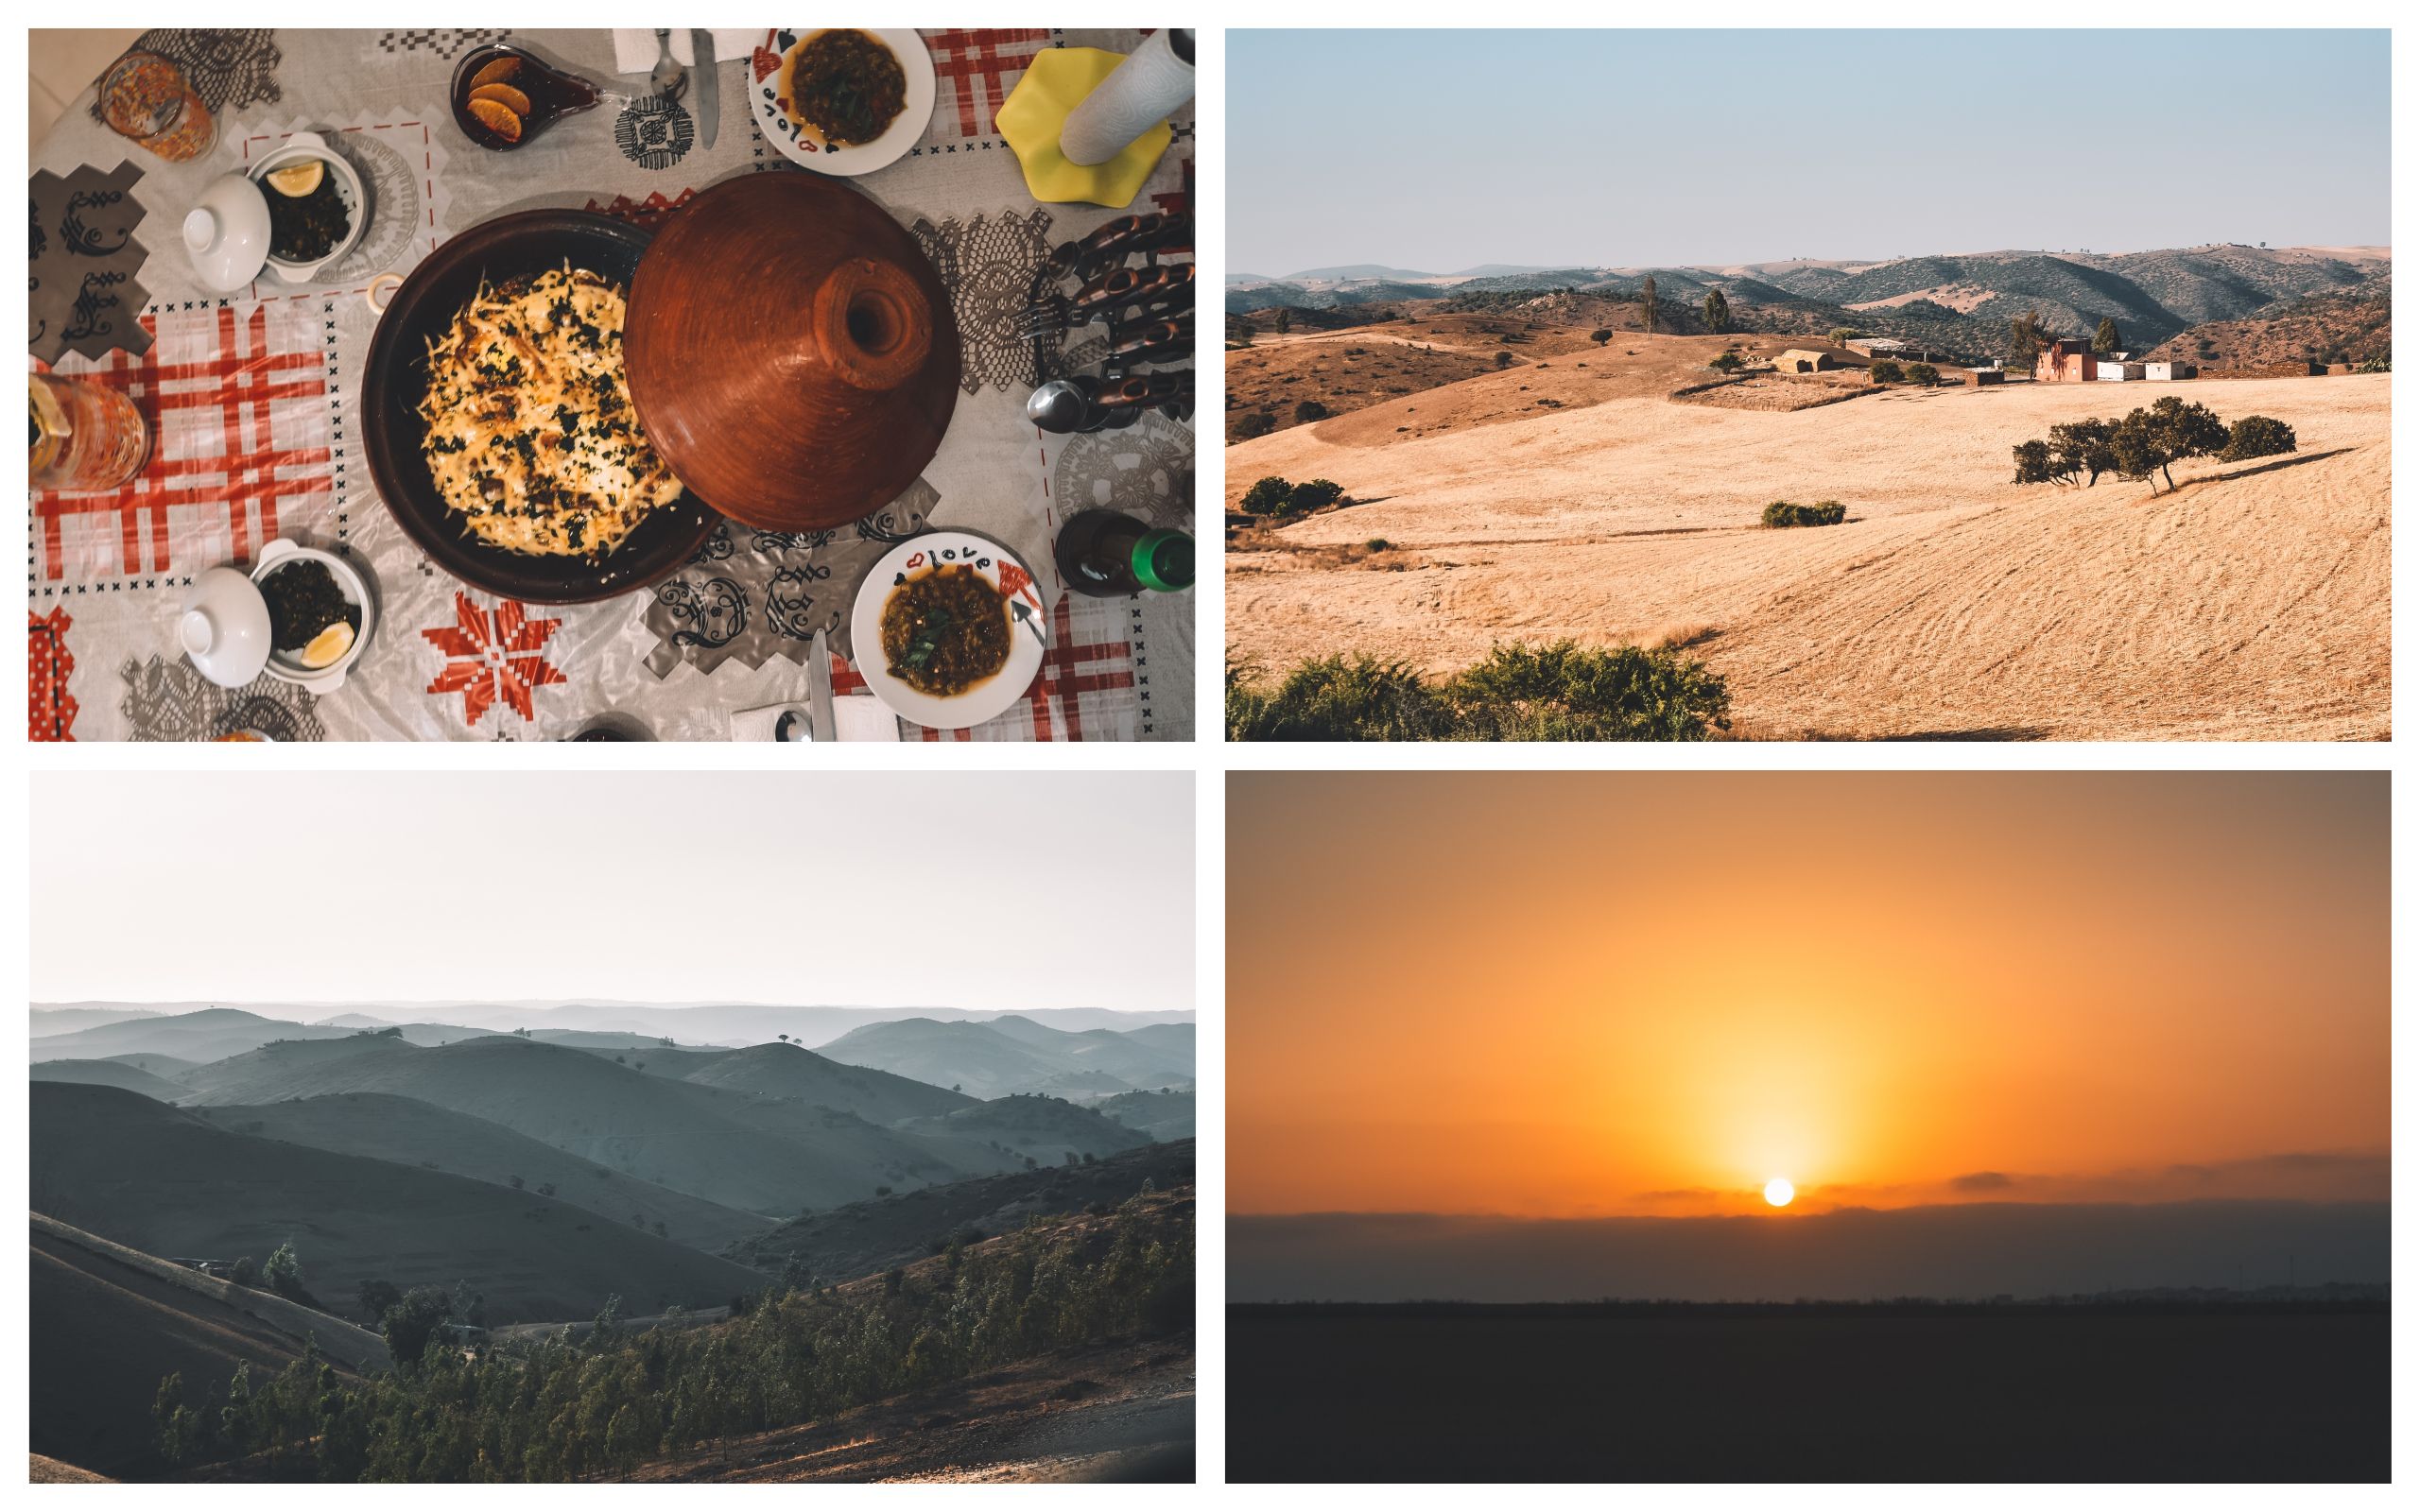 maroc blog voyage